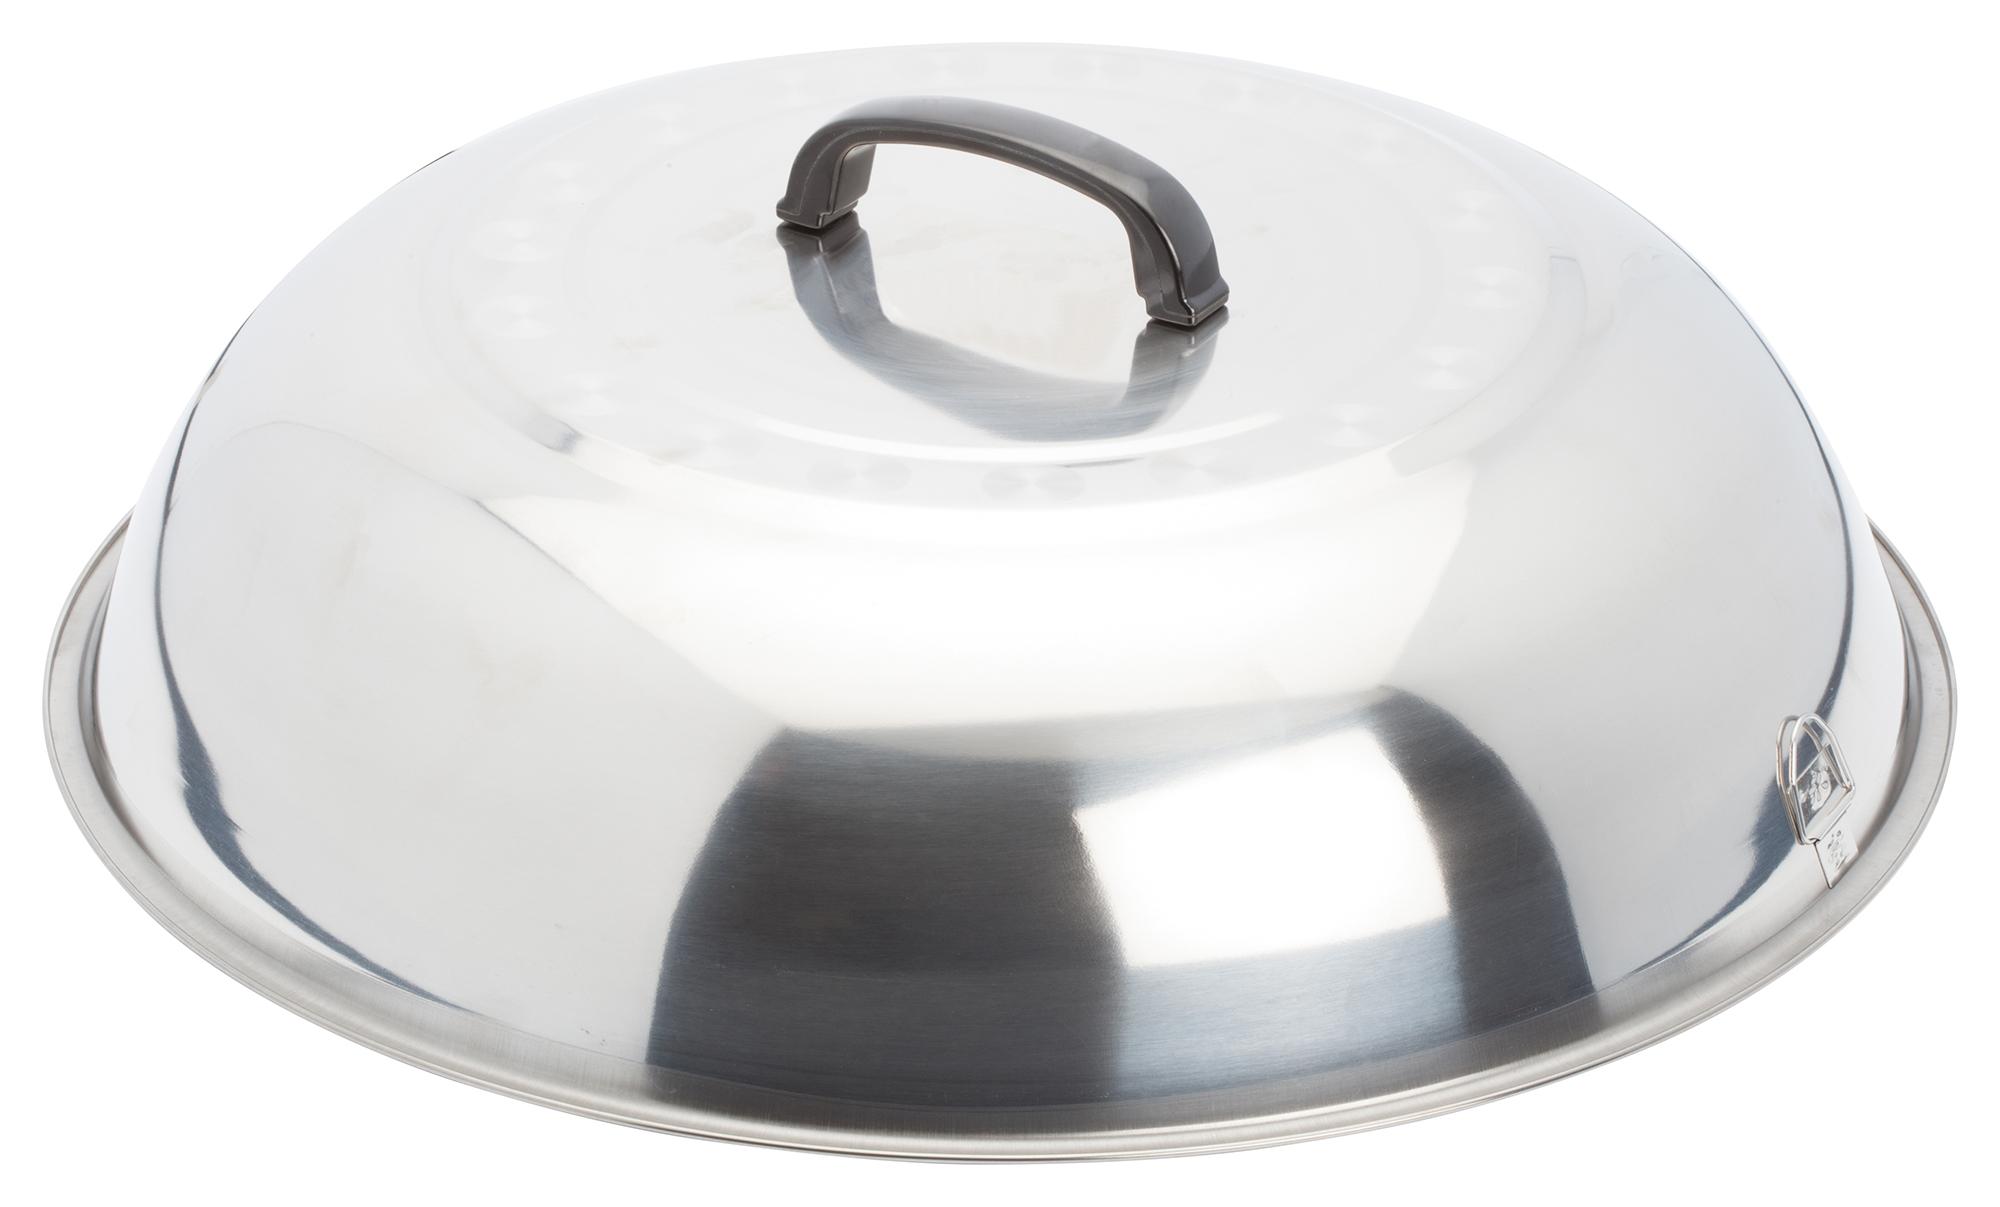 Winco WKCS-18 wok cover